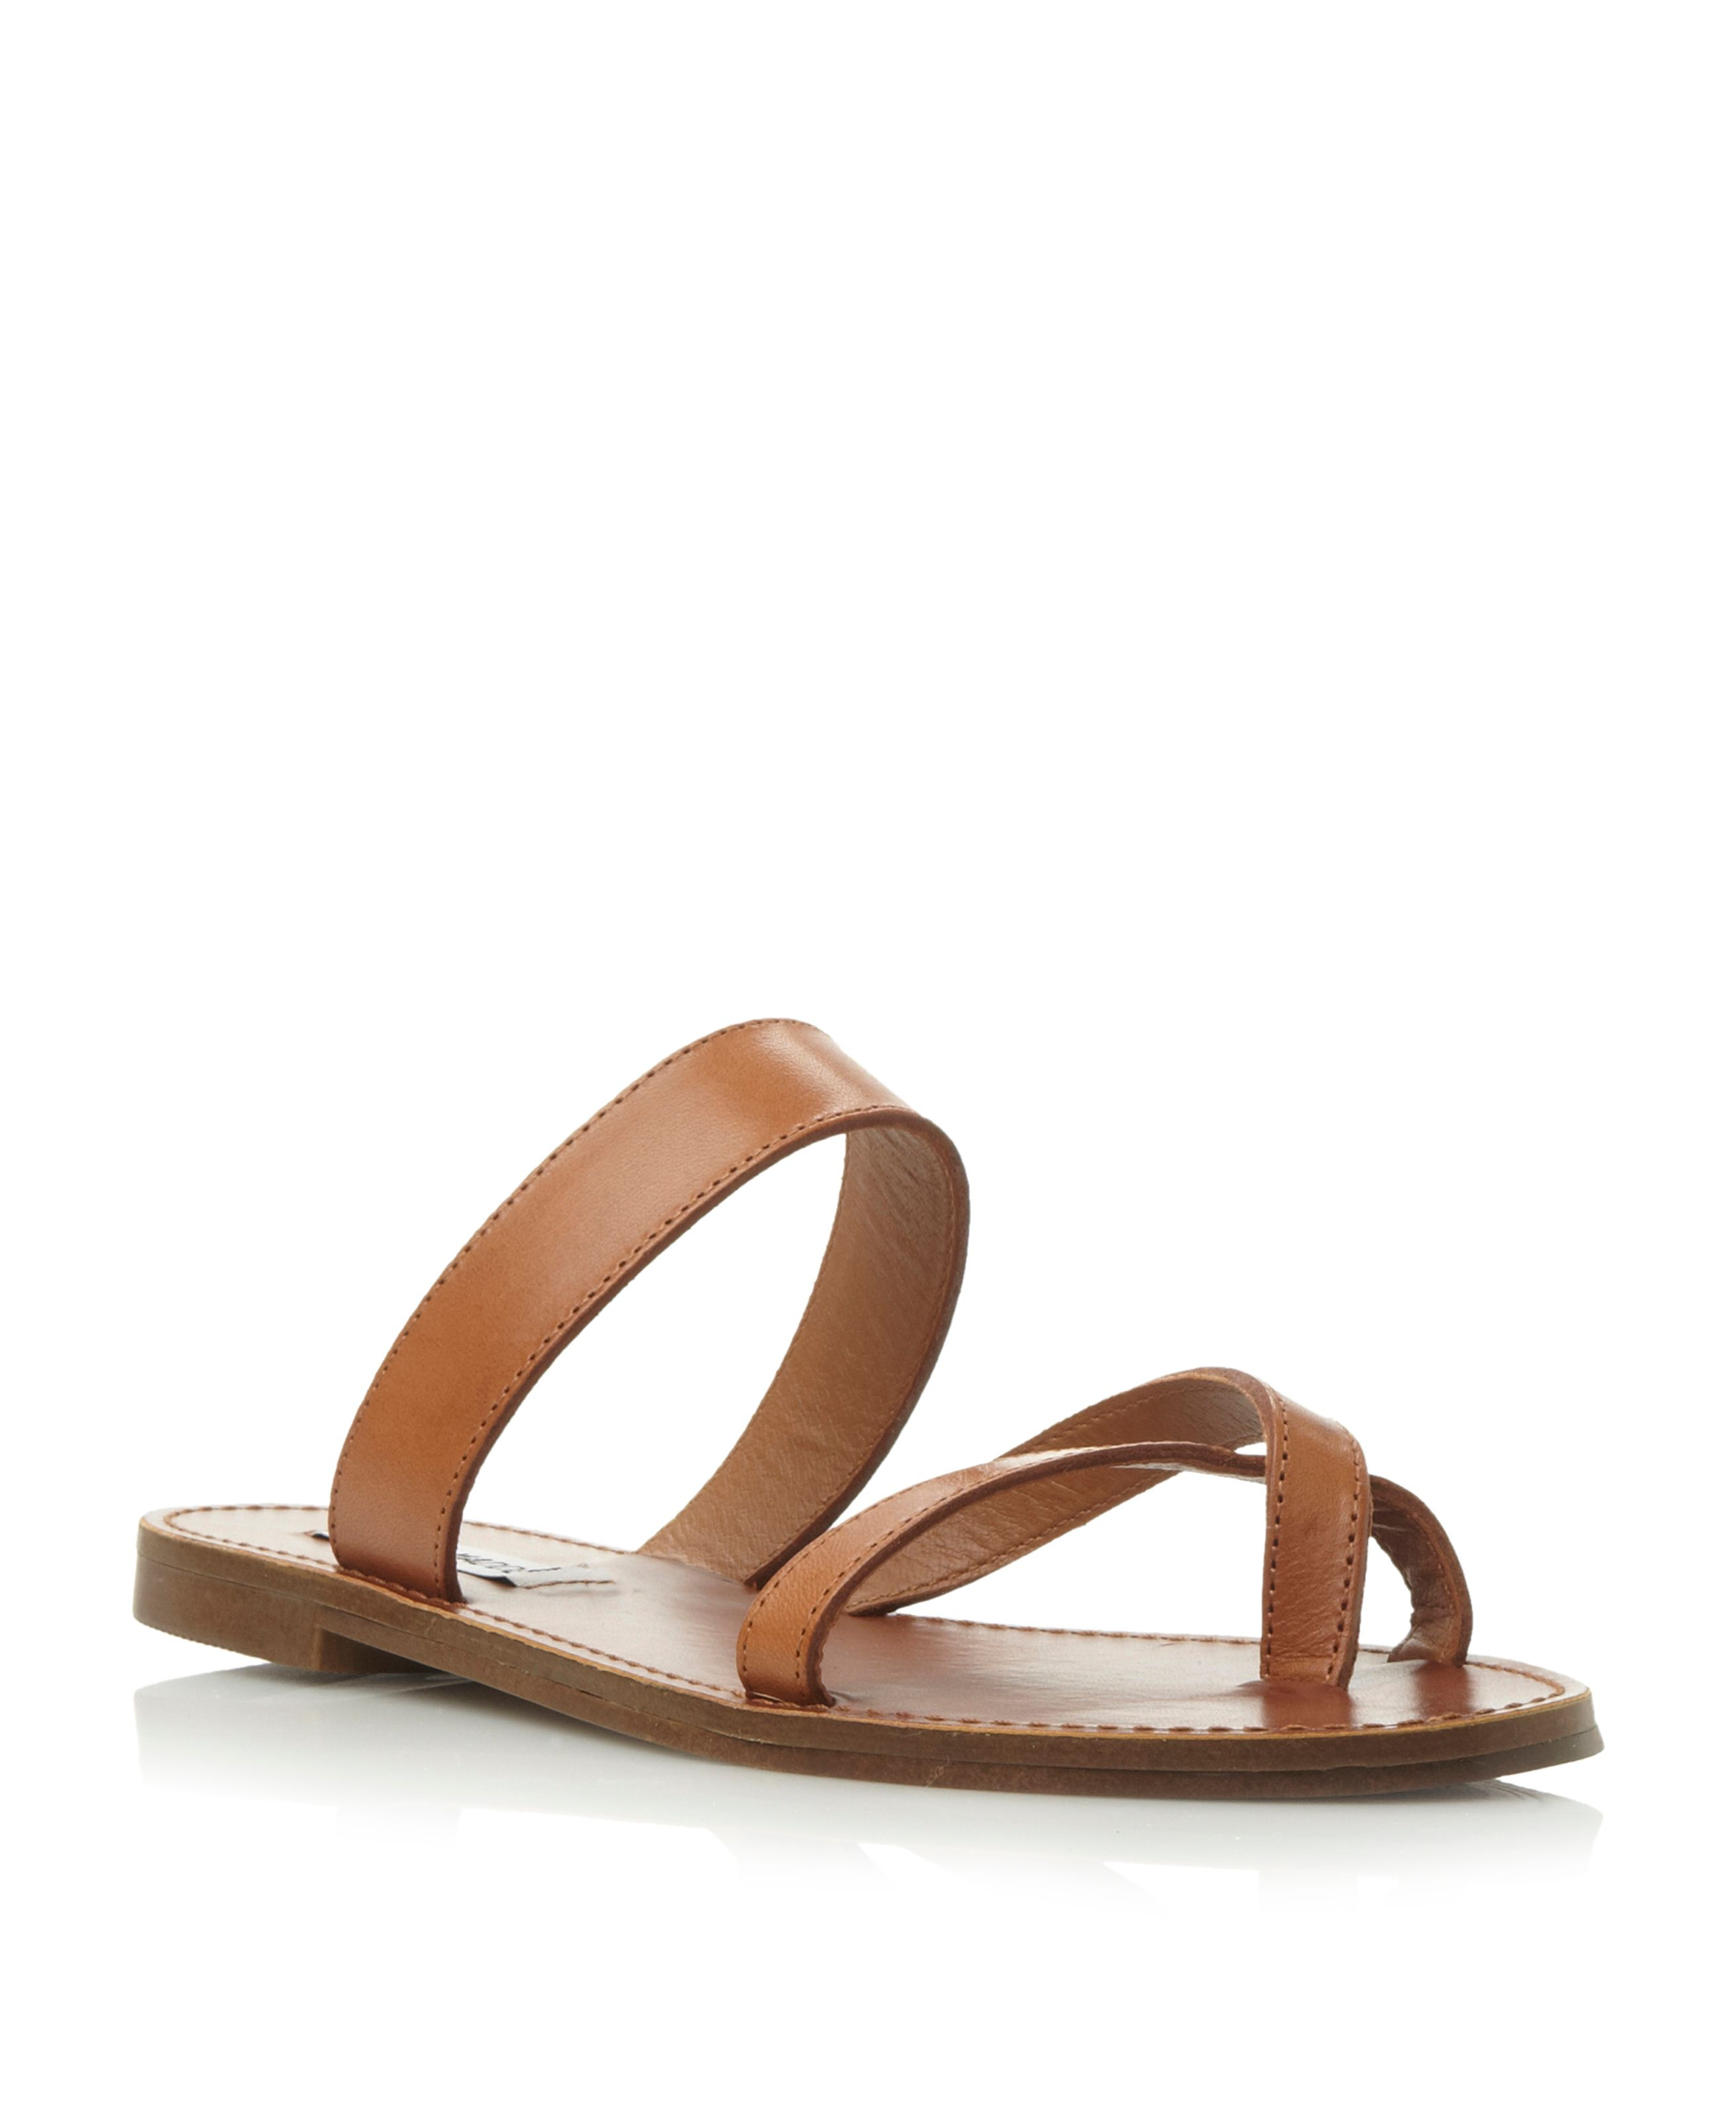 Steve Madden Aintso Sm Strappy Ring Toe Flat Sandal In